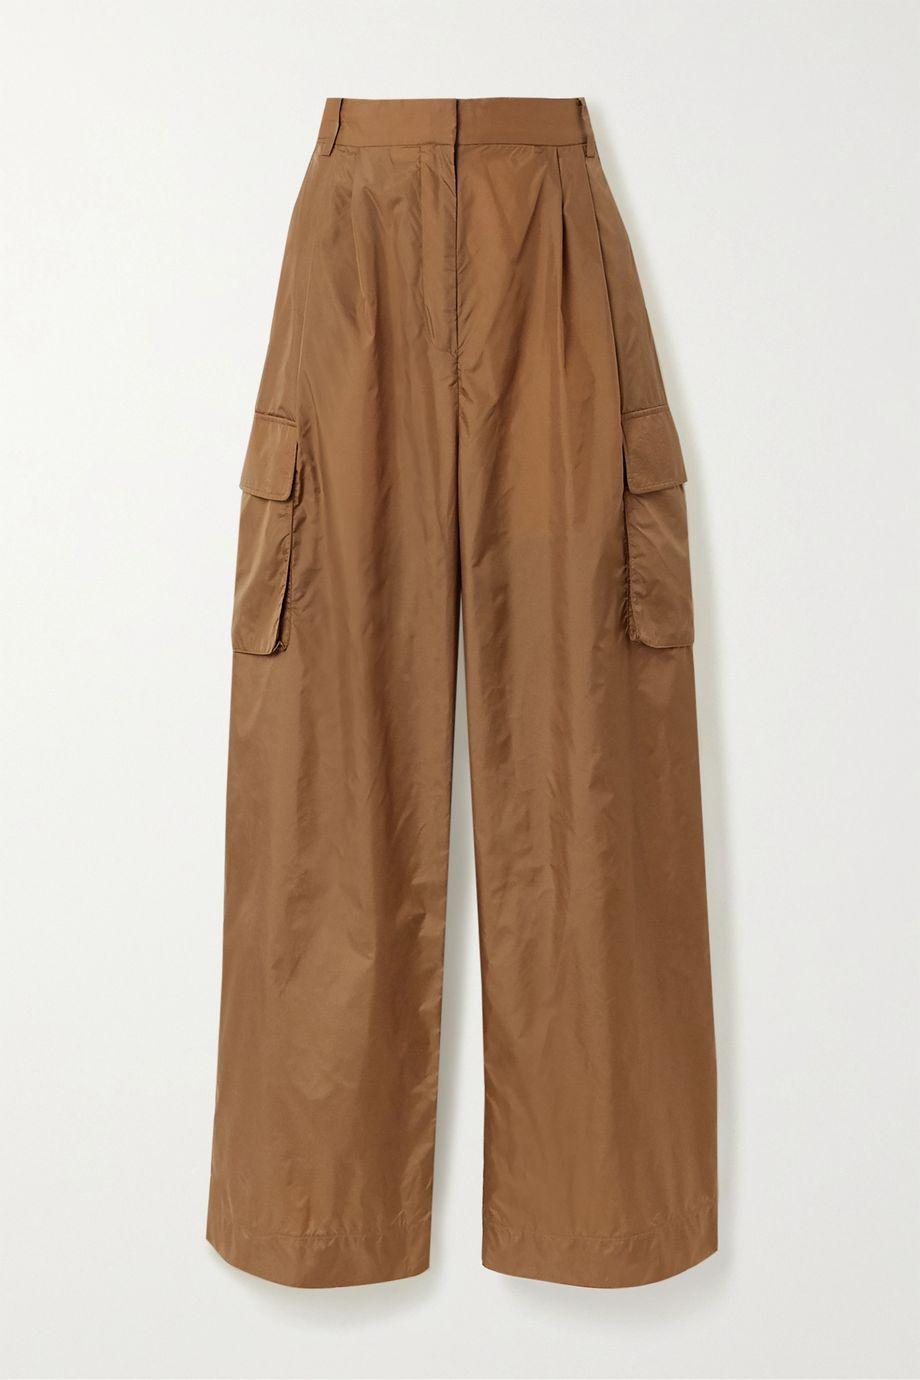 Tibi Pleated shell wide-leg cargo pants